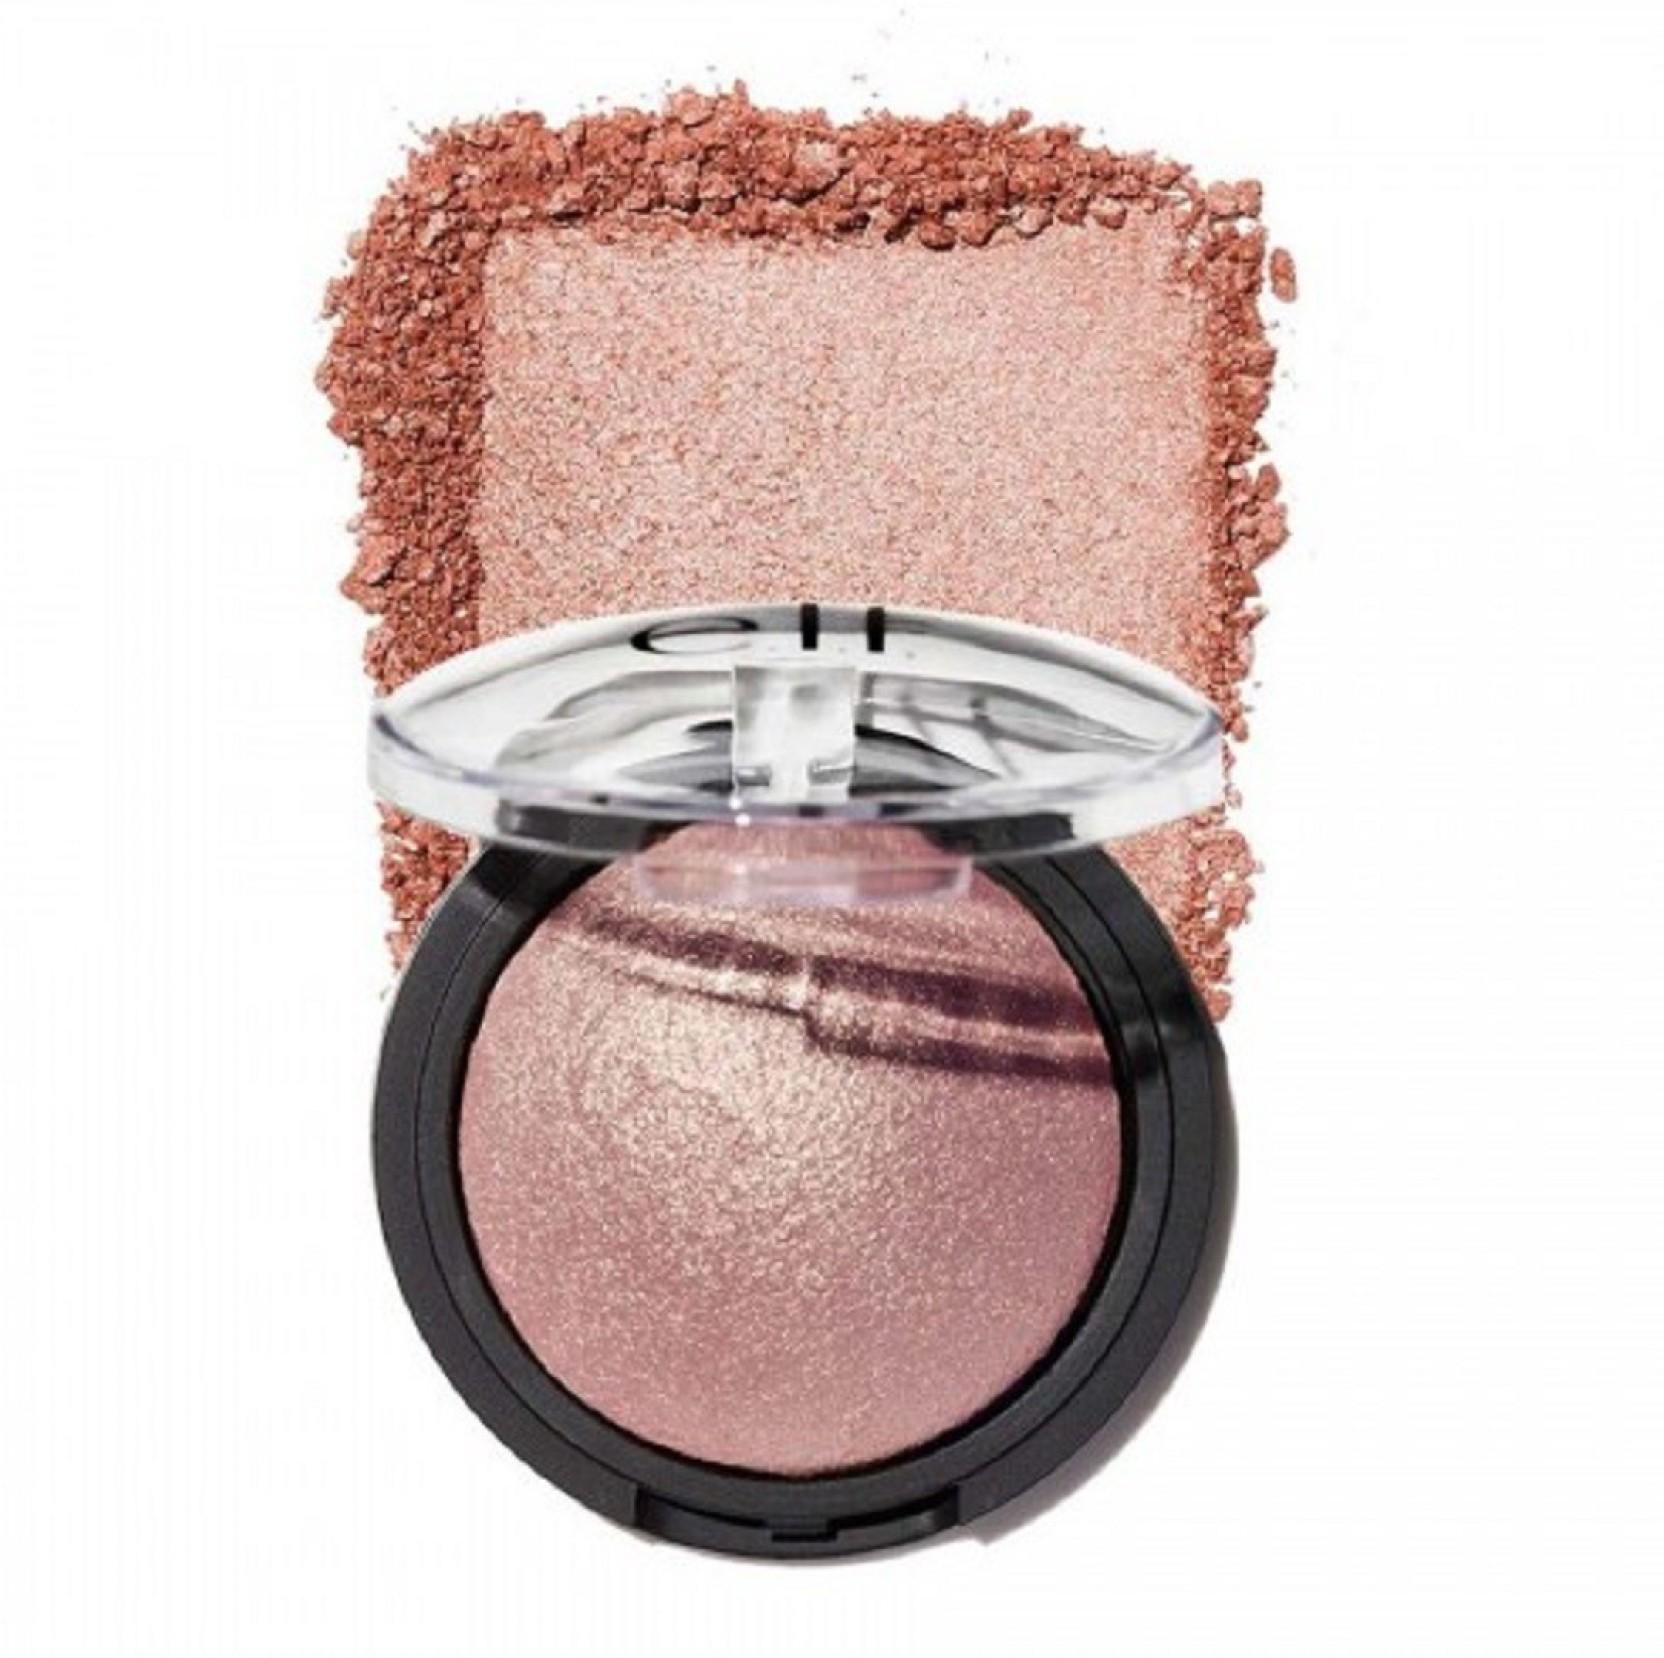 Elf Cosmetics Studio Baked Highlighter Pink Diamonds Home